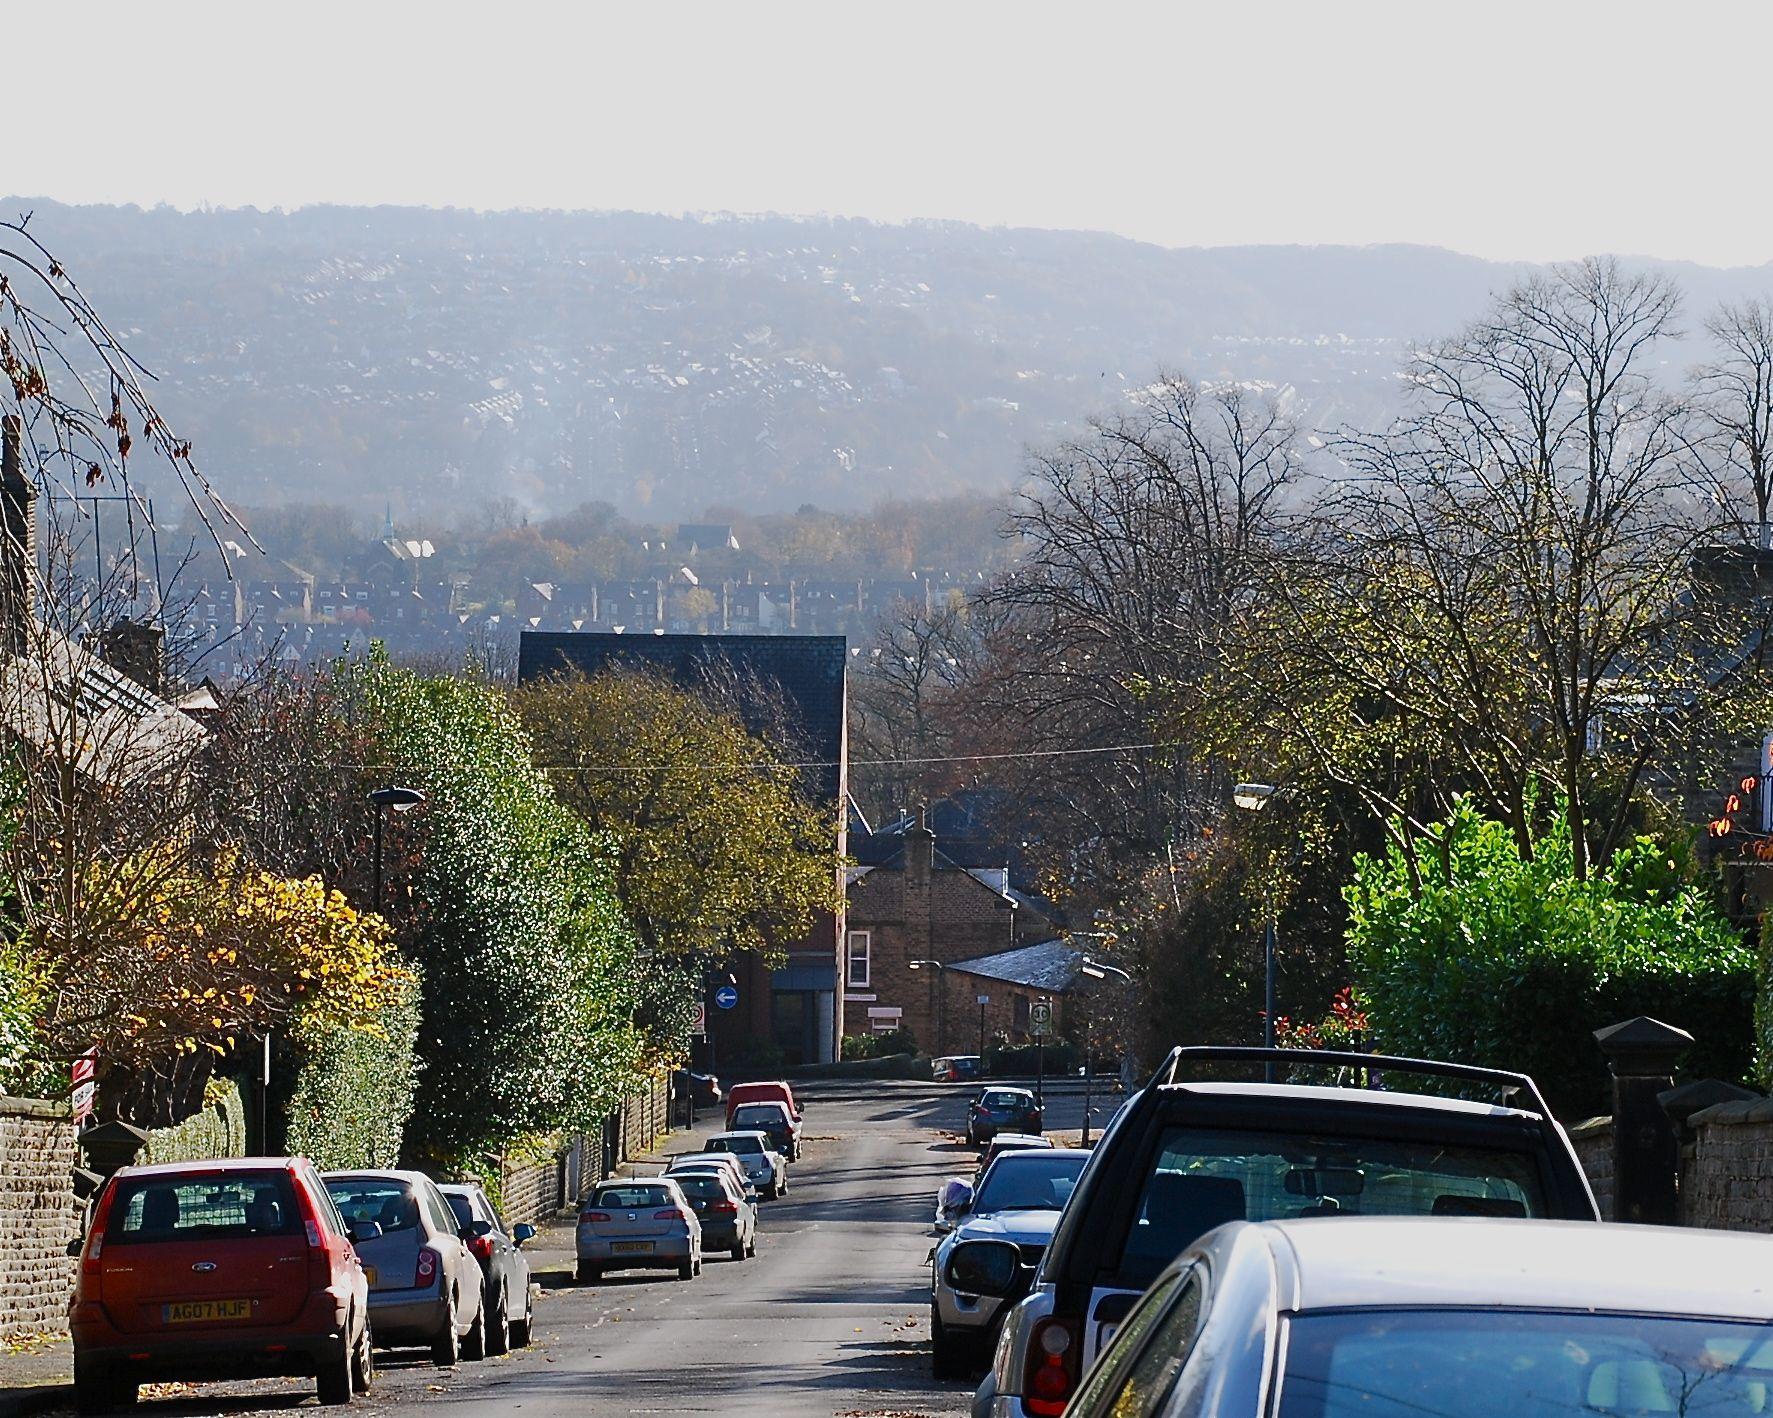 Views across the city